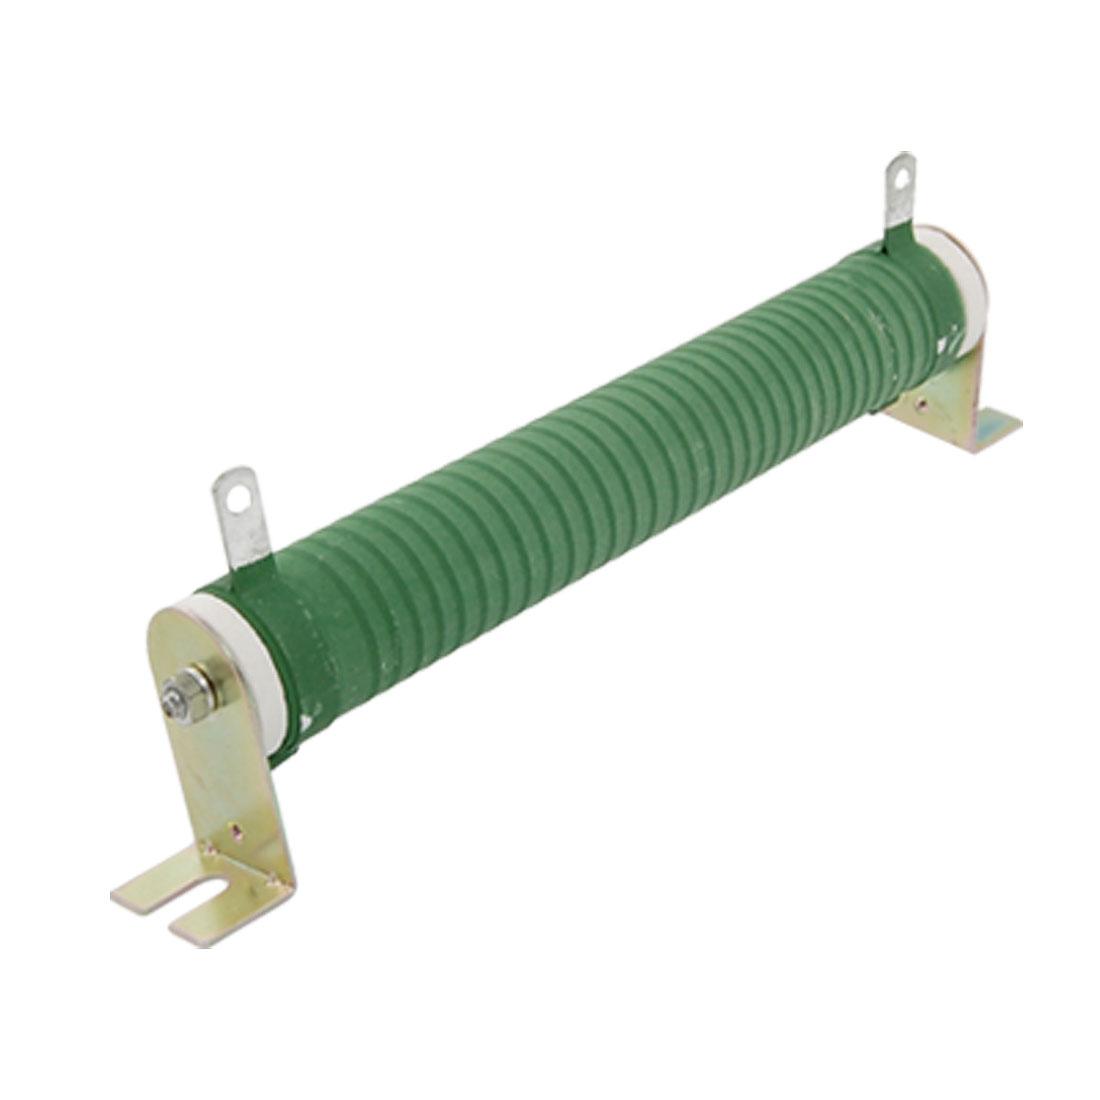 Ceramic Tube 100W 15 Ohm Wire Wound Resistor 100 Watts